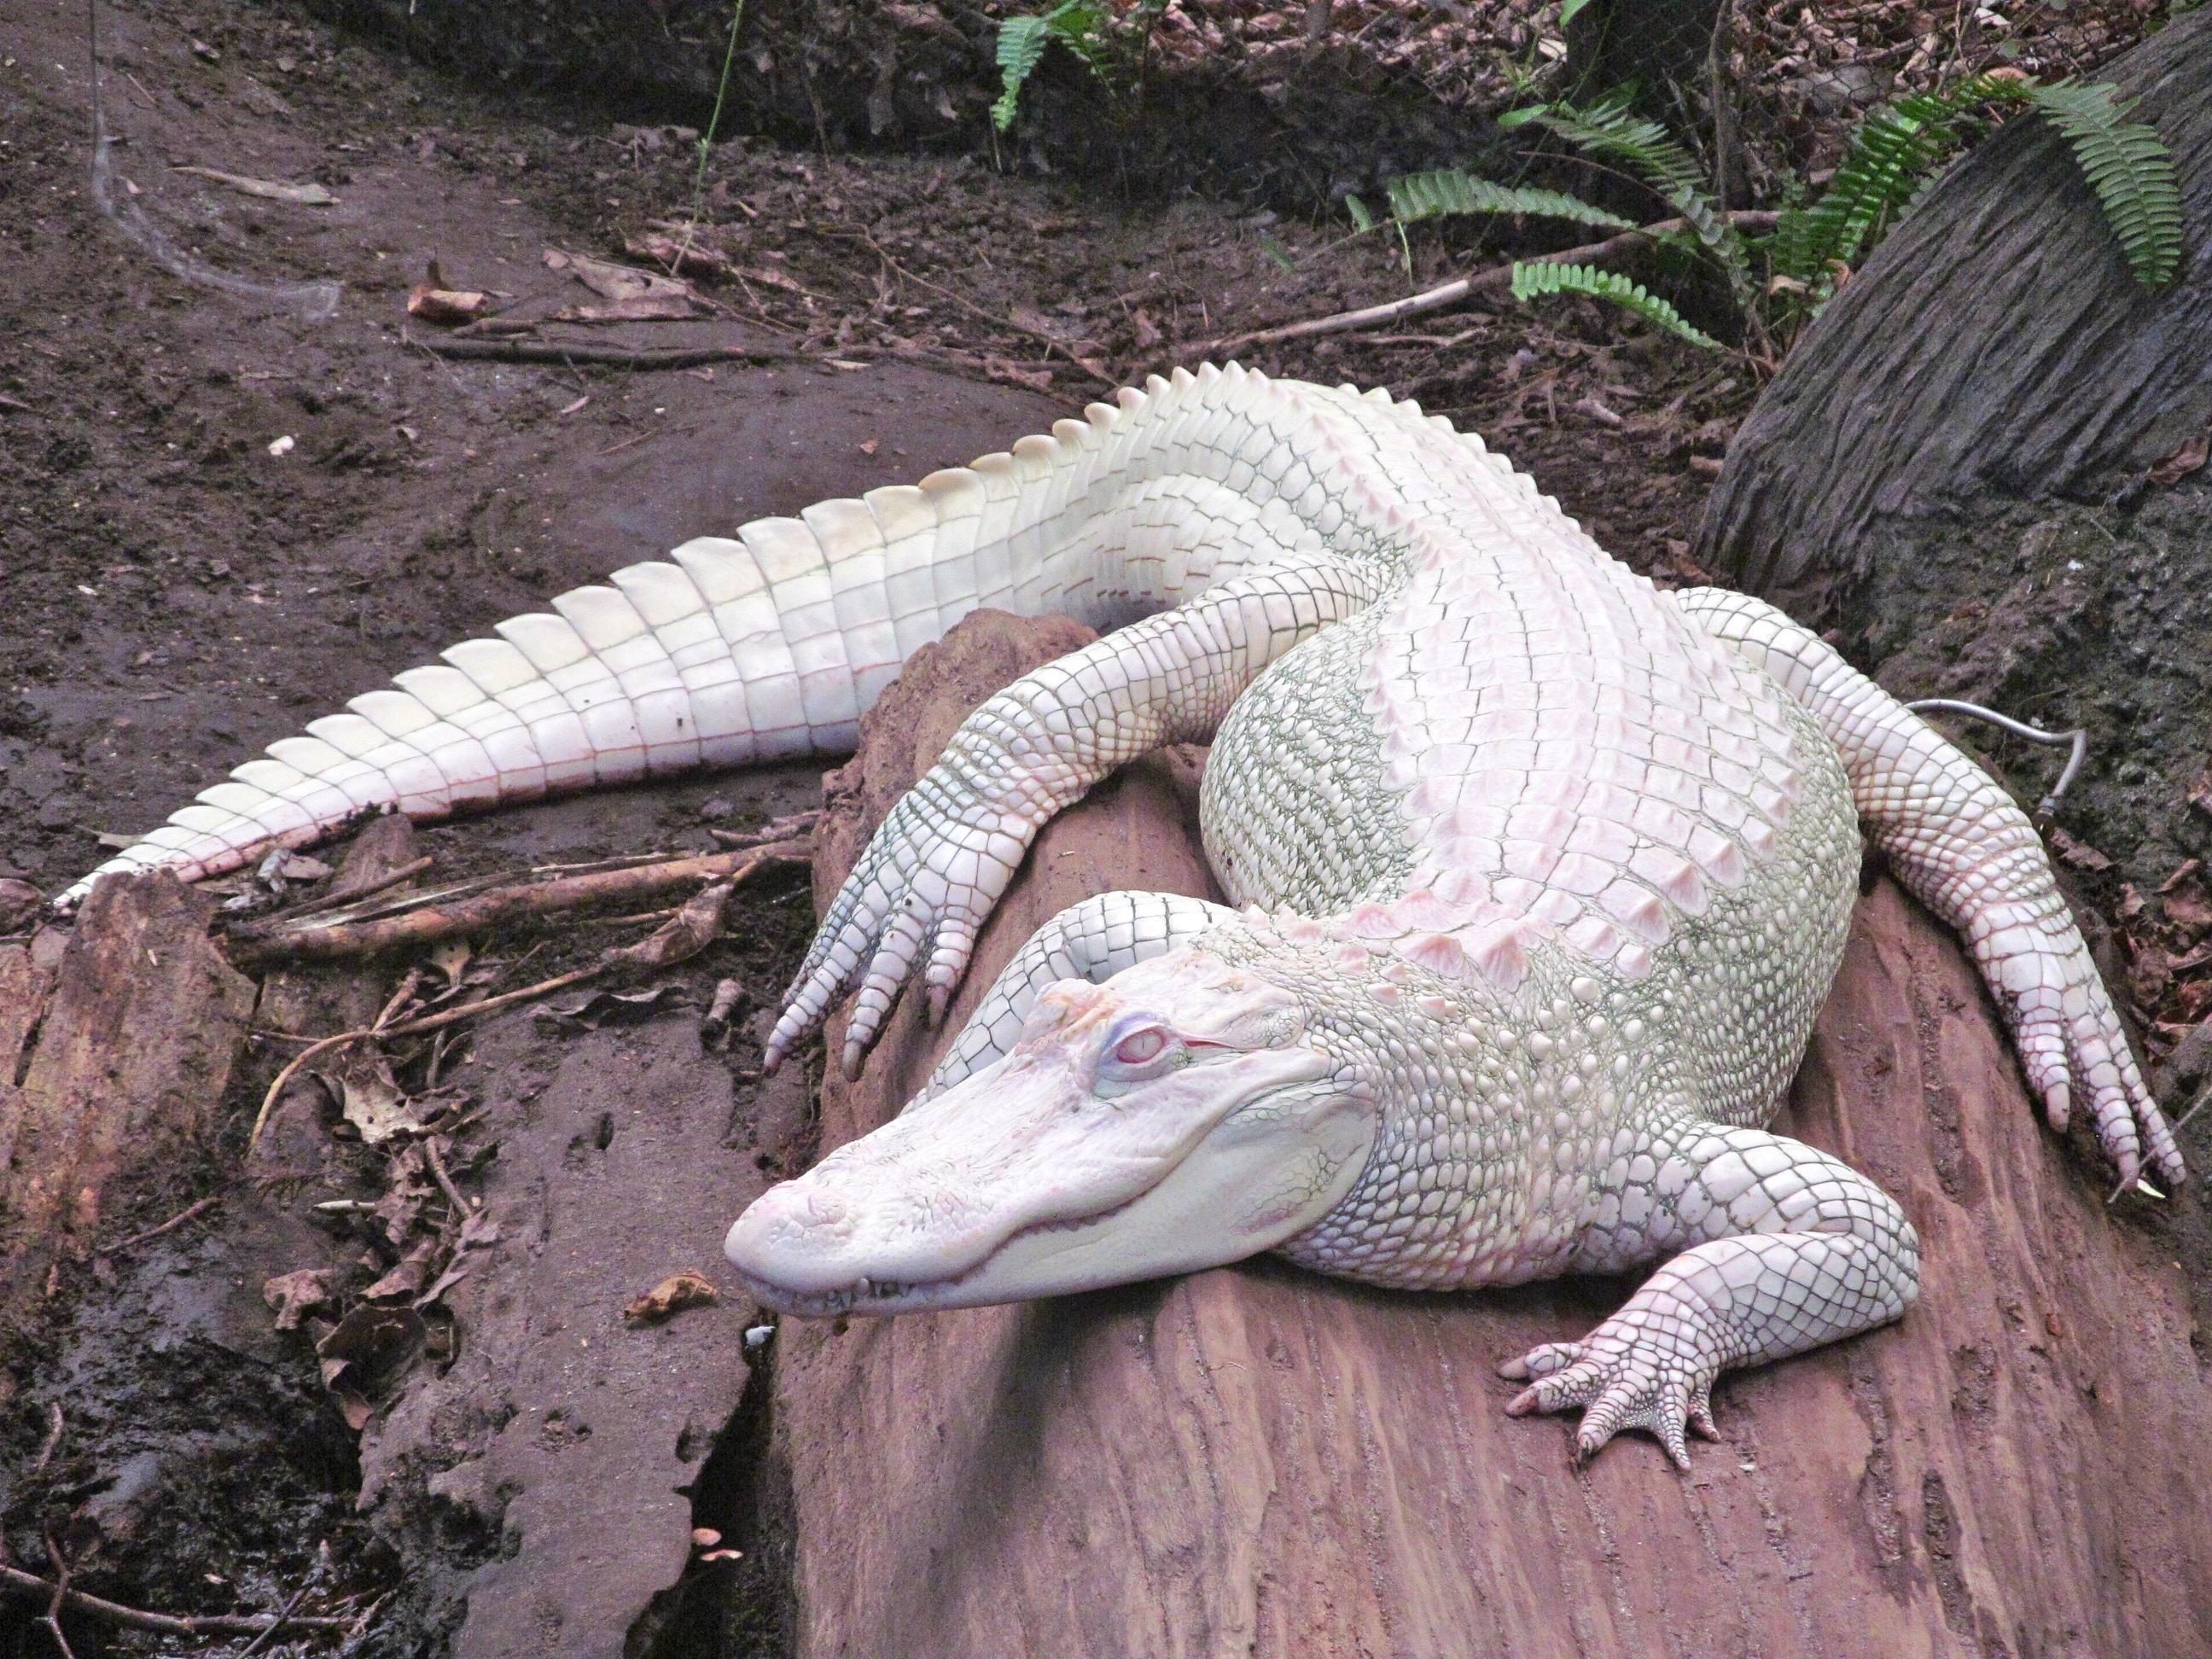 American Alligator photo